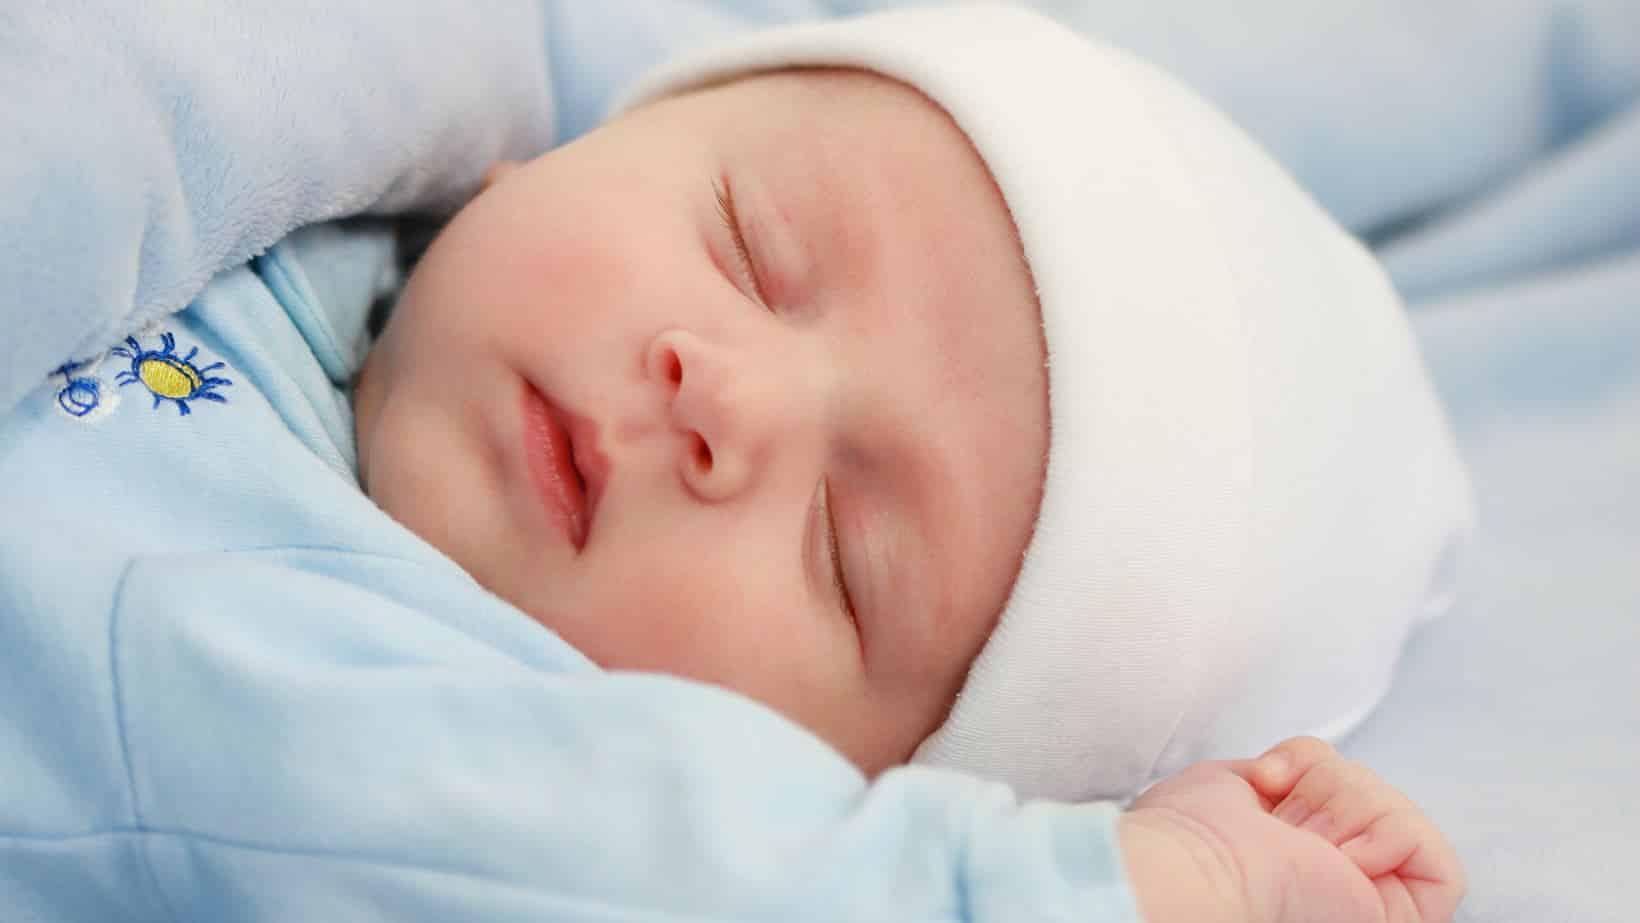 osteopathe rgo bébé